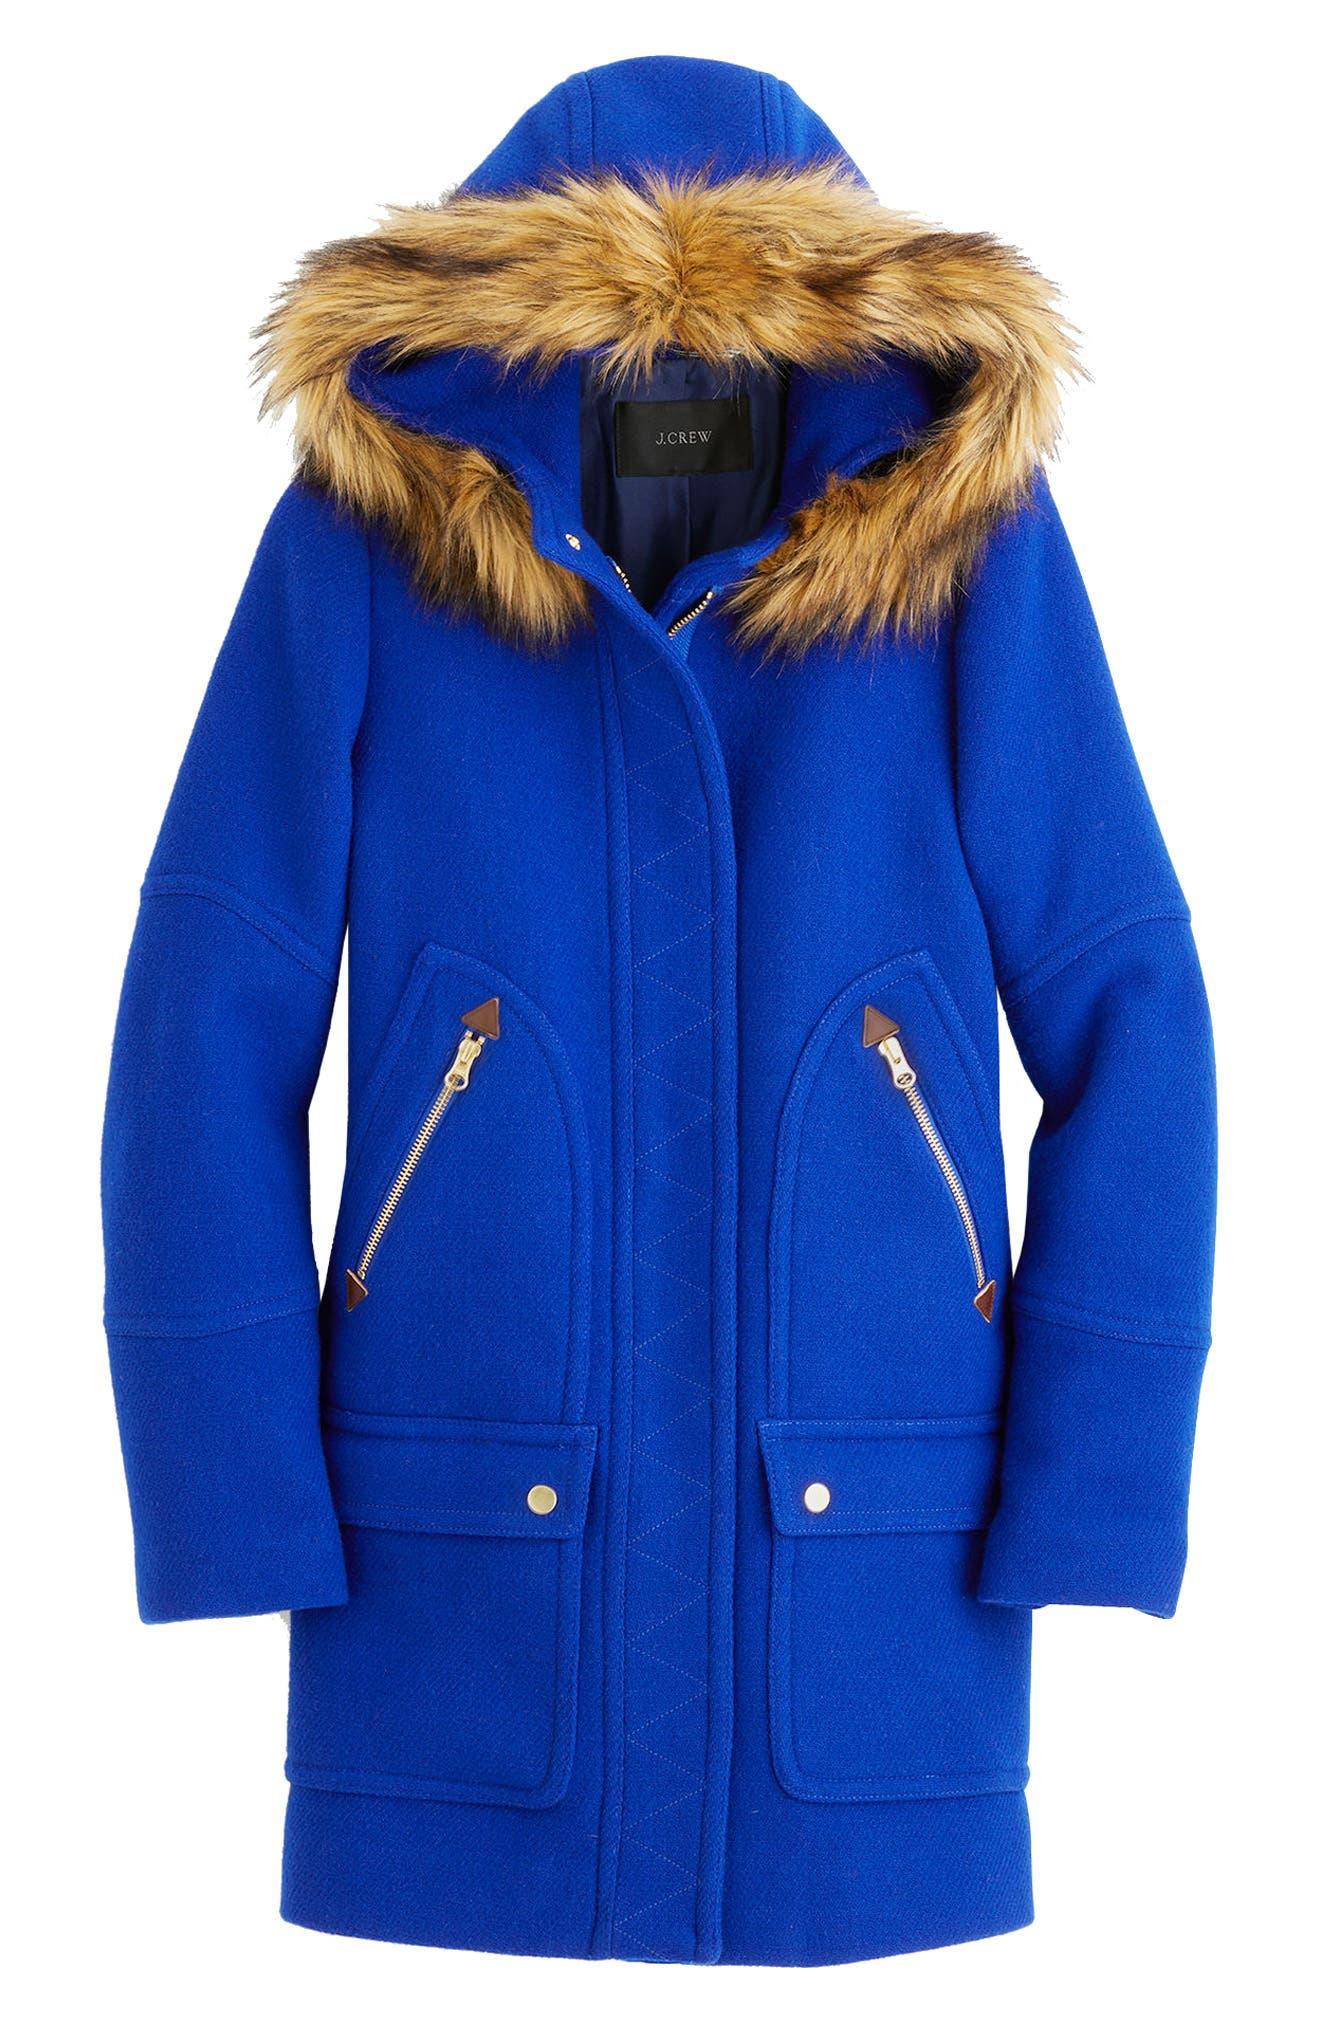 Women's Blue Coats & Jackets | Nordstrom